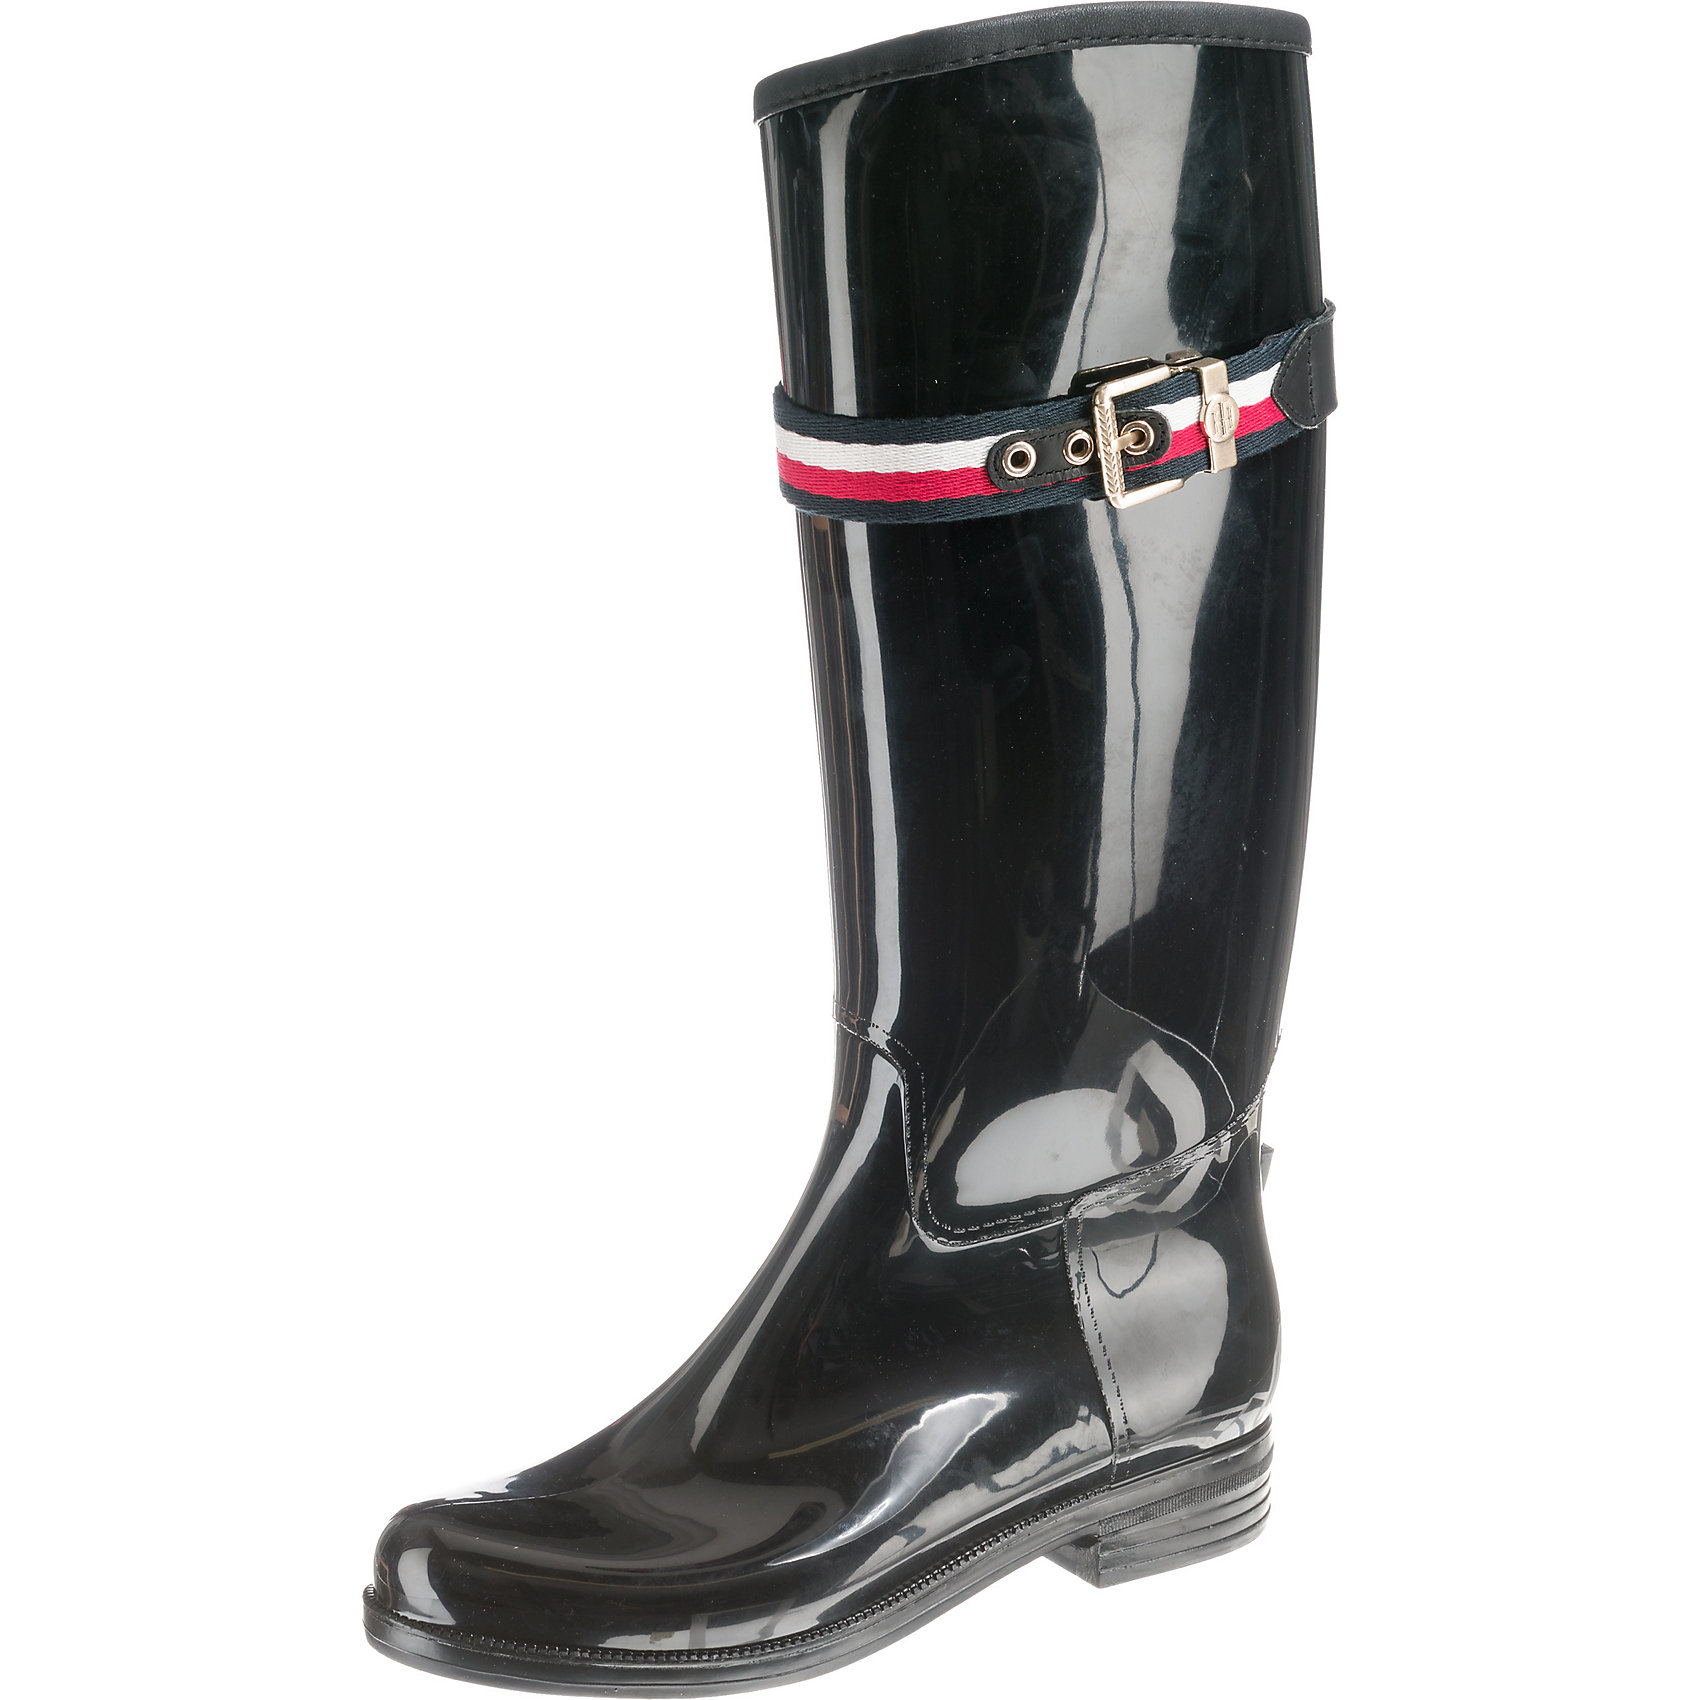 Neu TOMMY HILFIGER CORPORATE BELT LONG RAIN RAIN RAIN BOOT Klassische Stiefel 8861961 561625